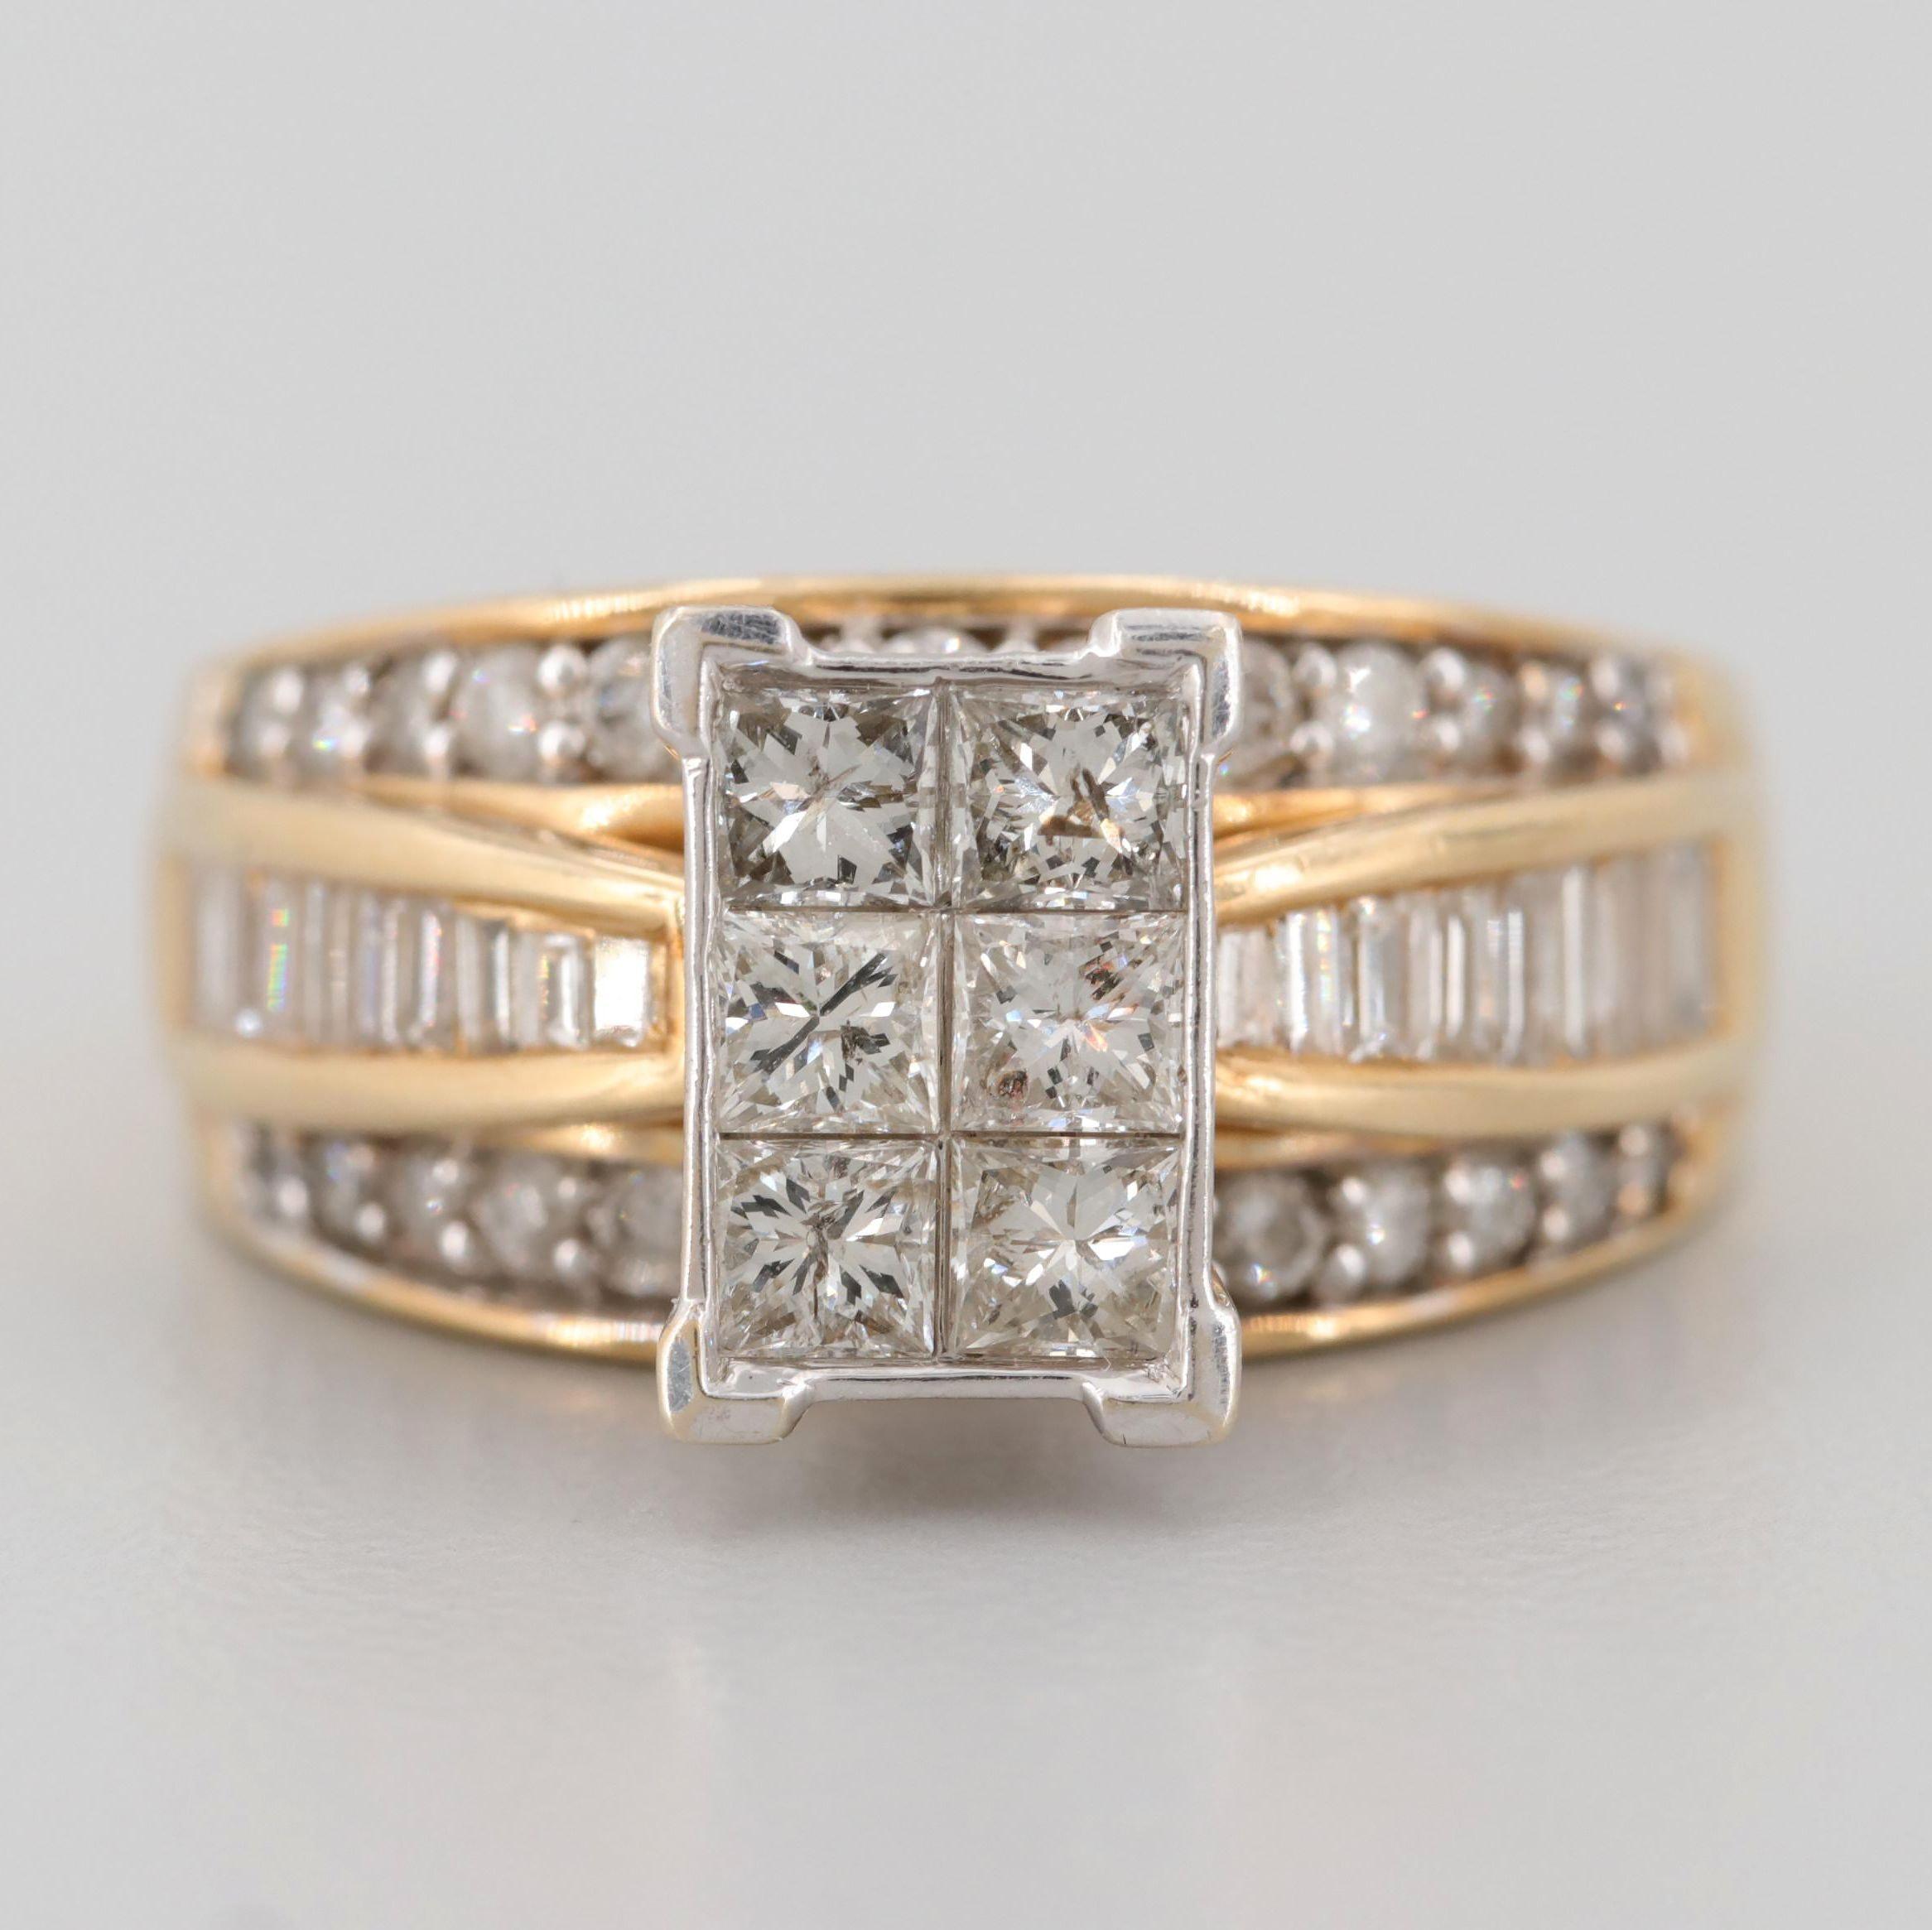 14K Yellow Gold 1.50 CTW Diamond Ring